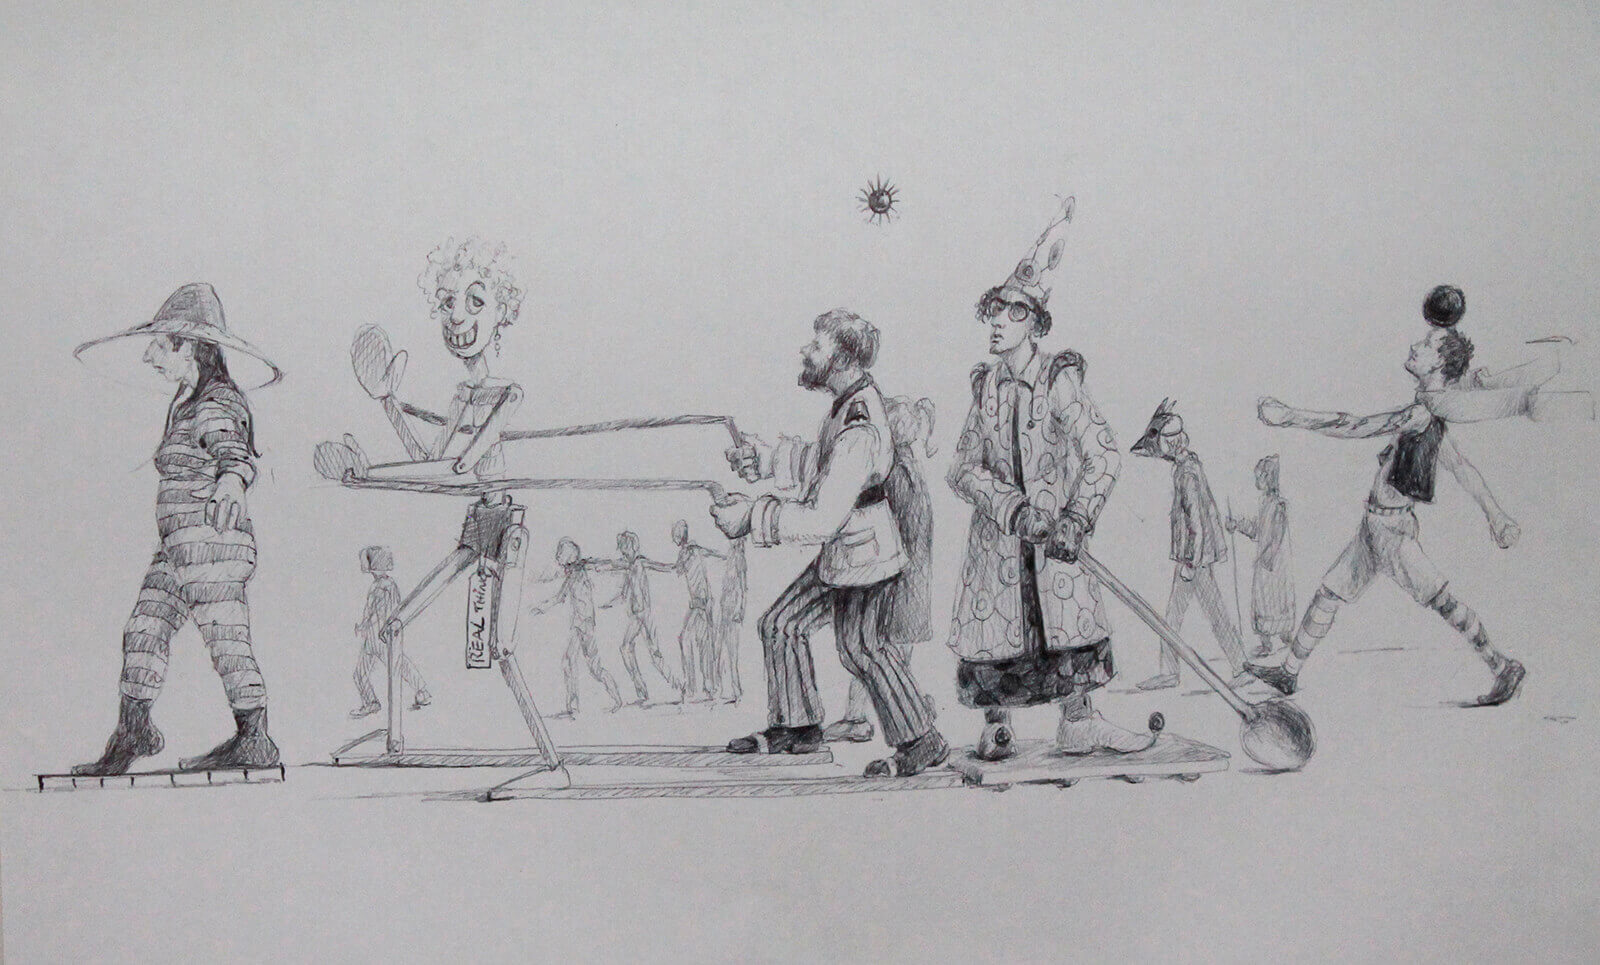 Walker 5 artwork